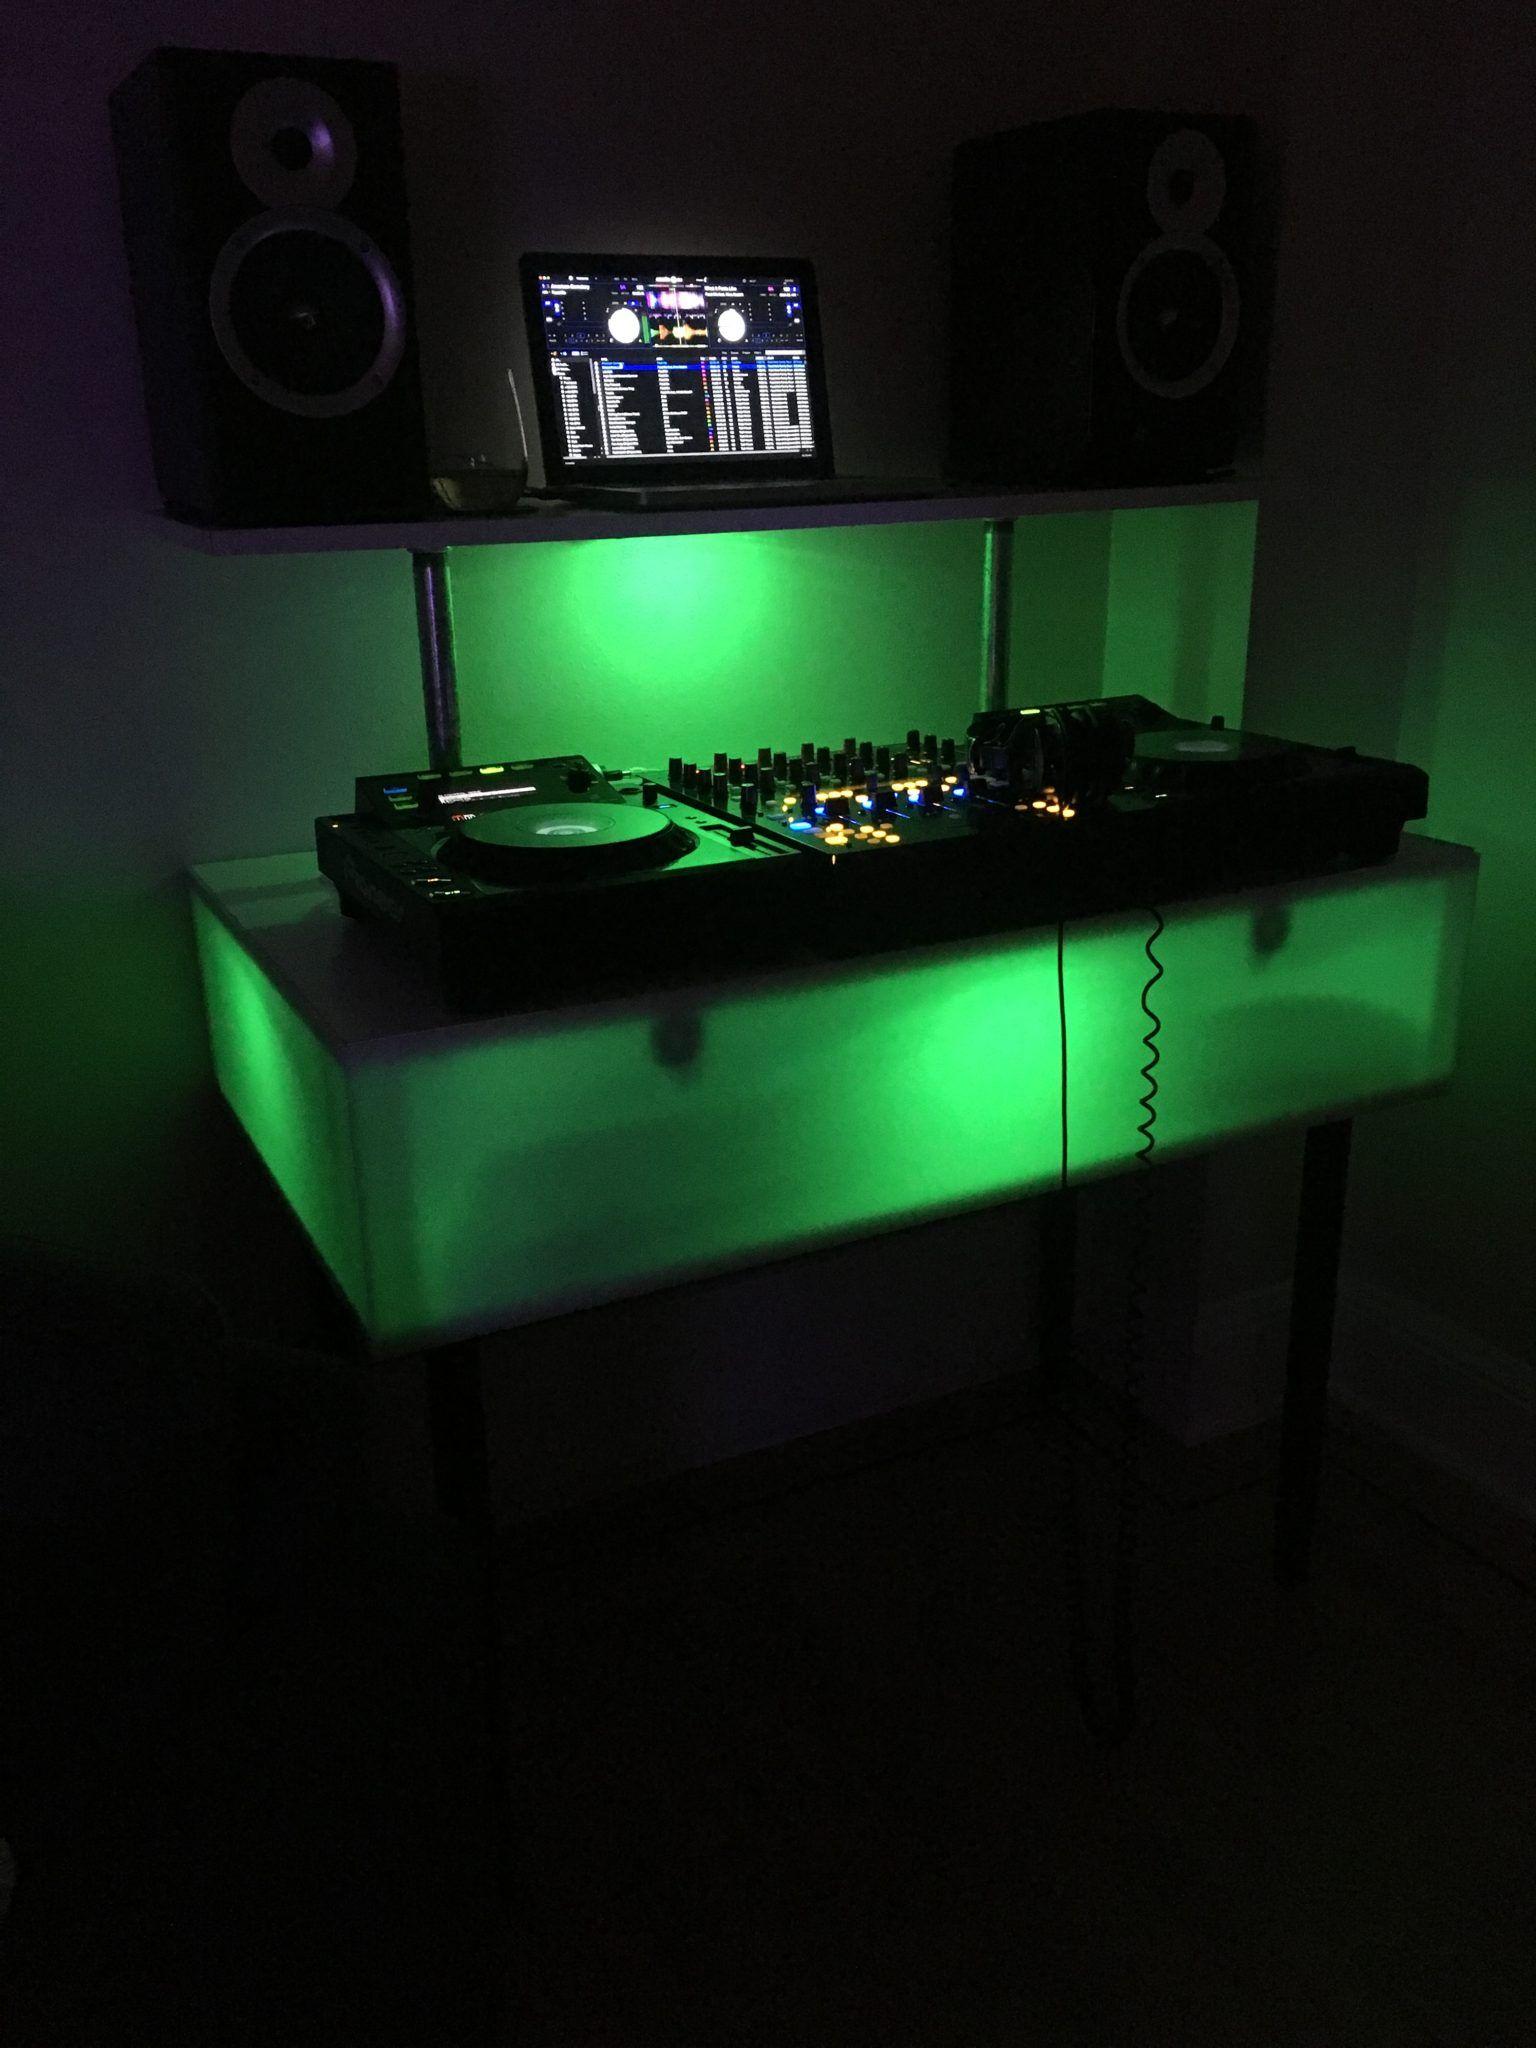 DIY How To Build A Light Up DJ Booth Dj booth, Building